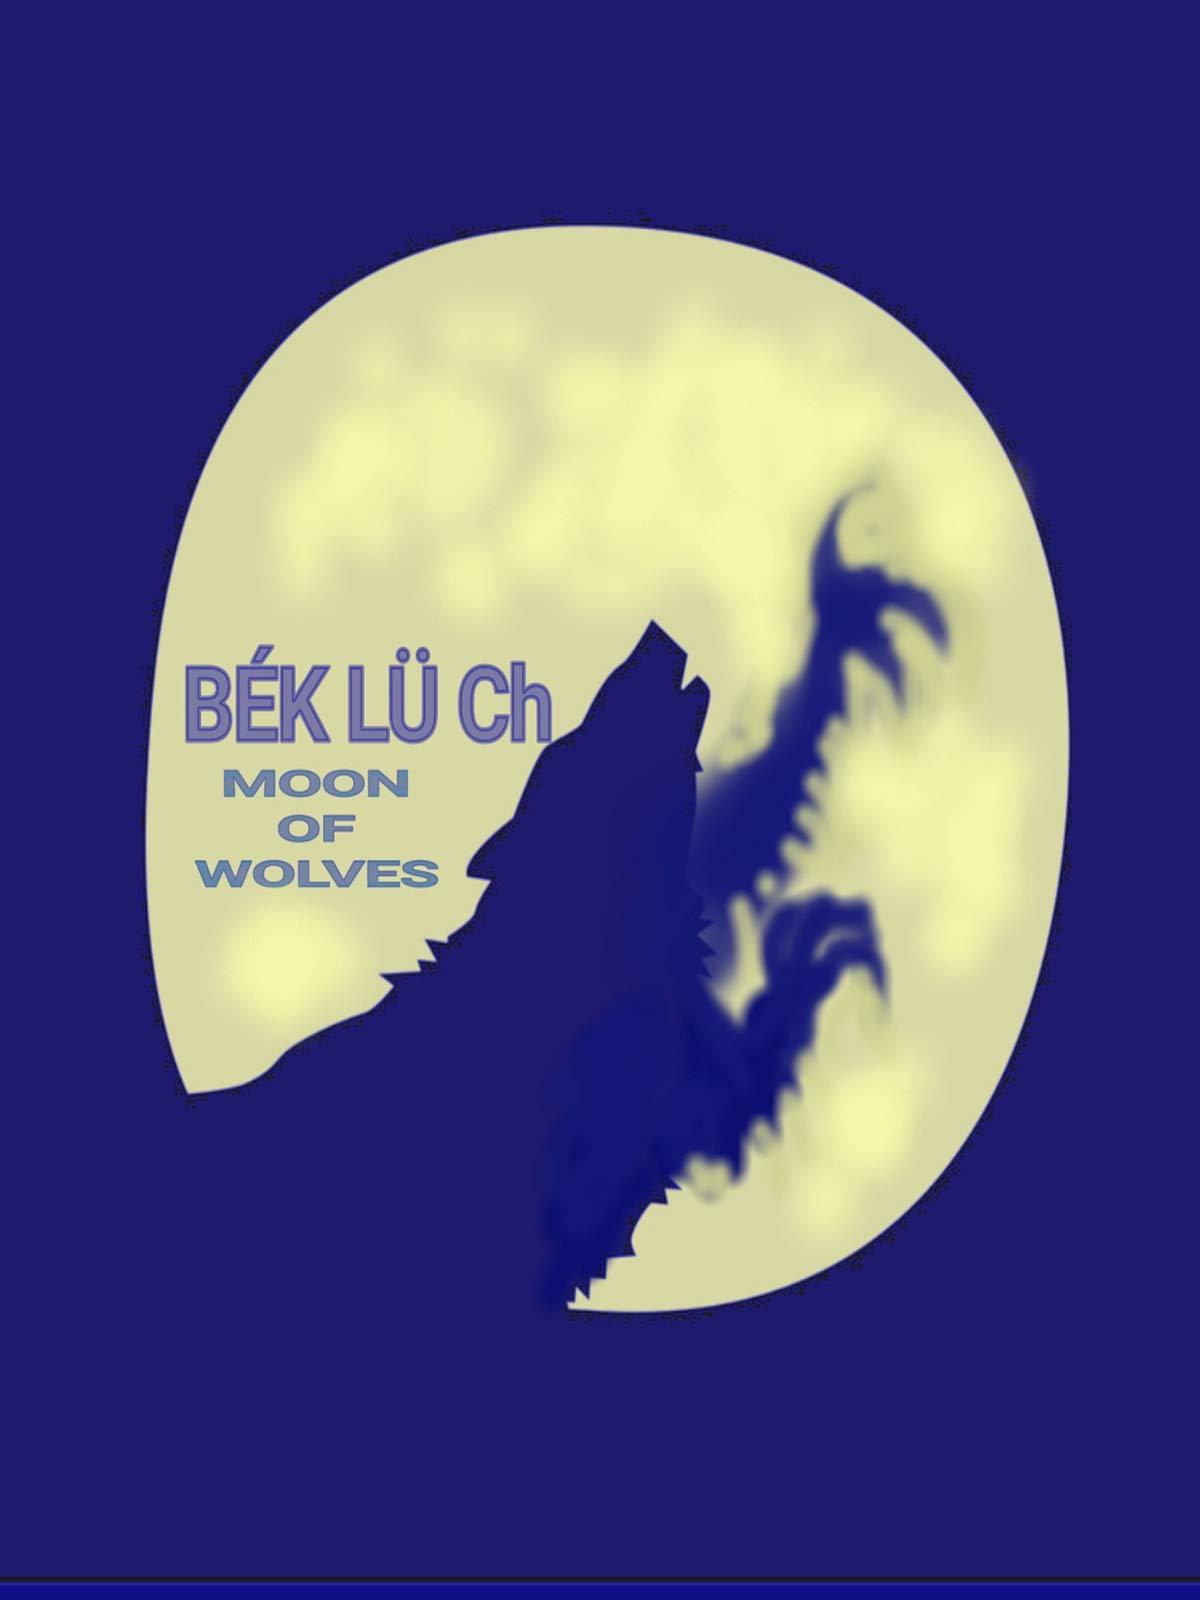 Bek lu ch  (Moon of Wolves)